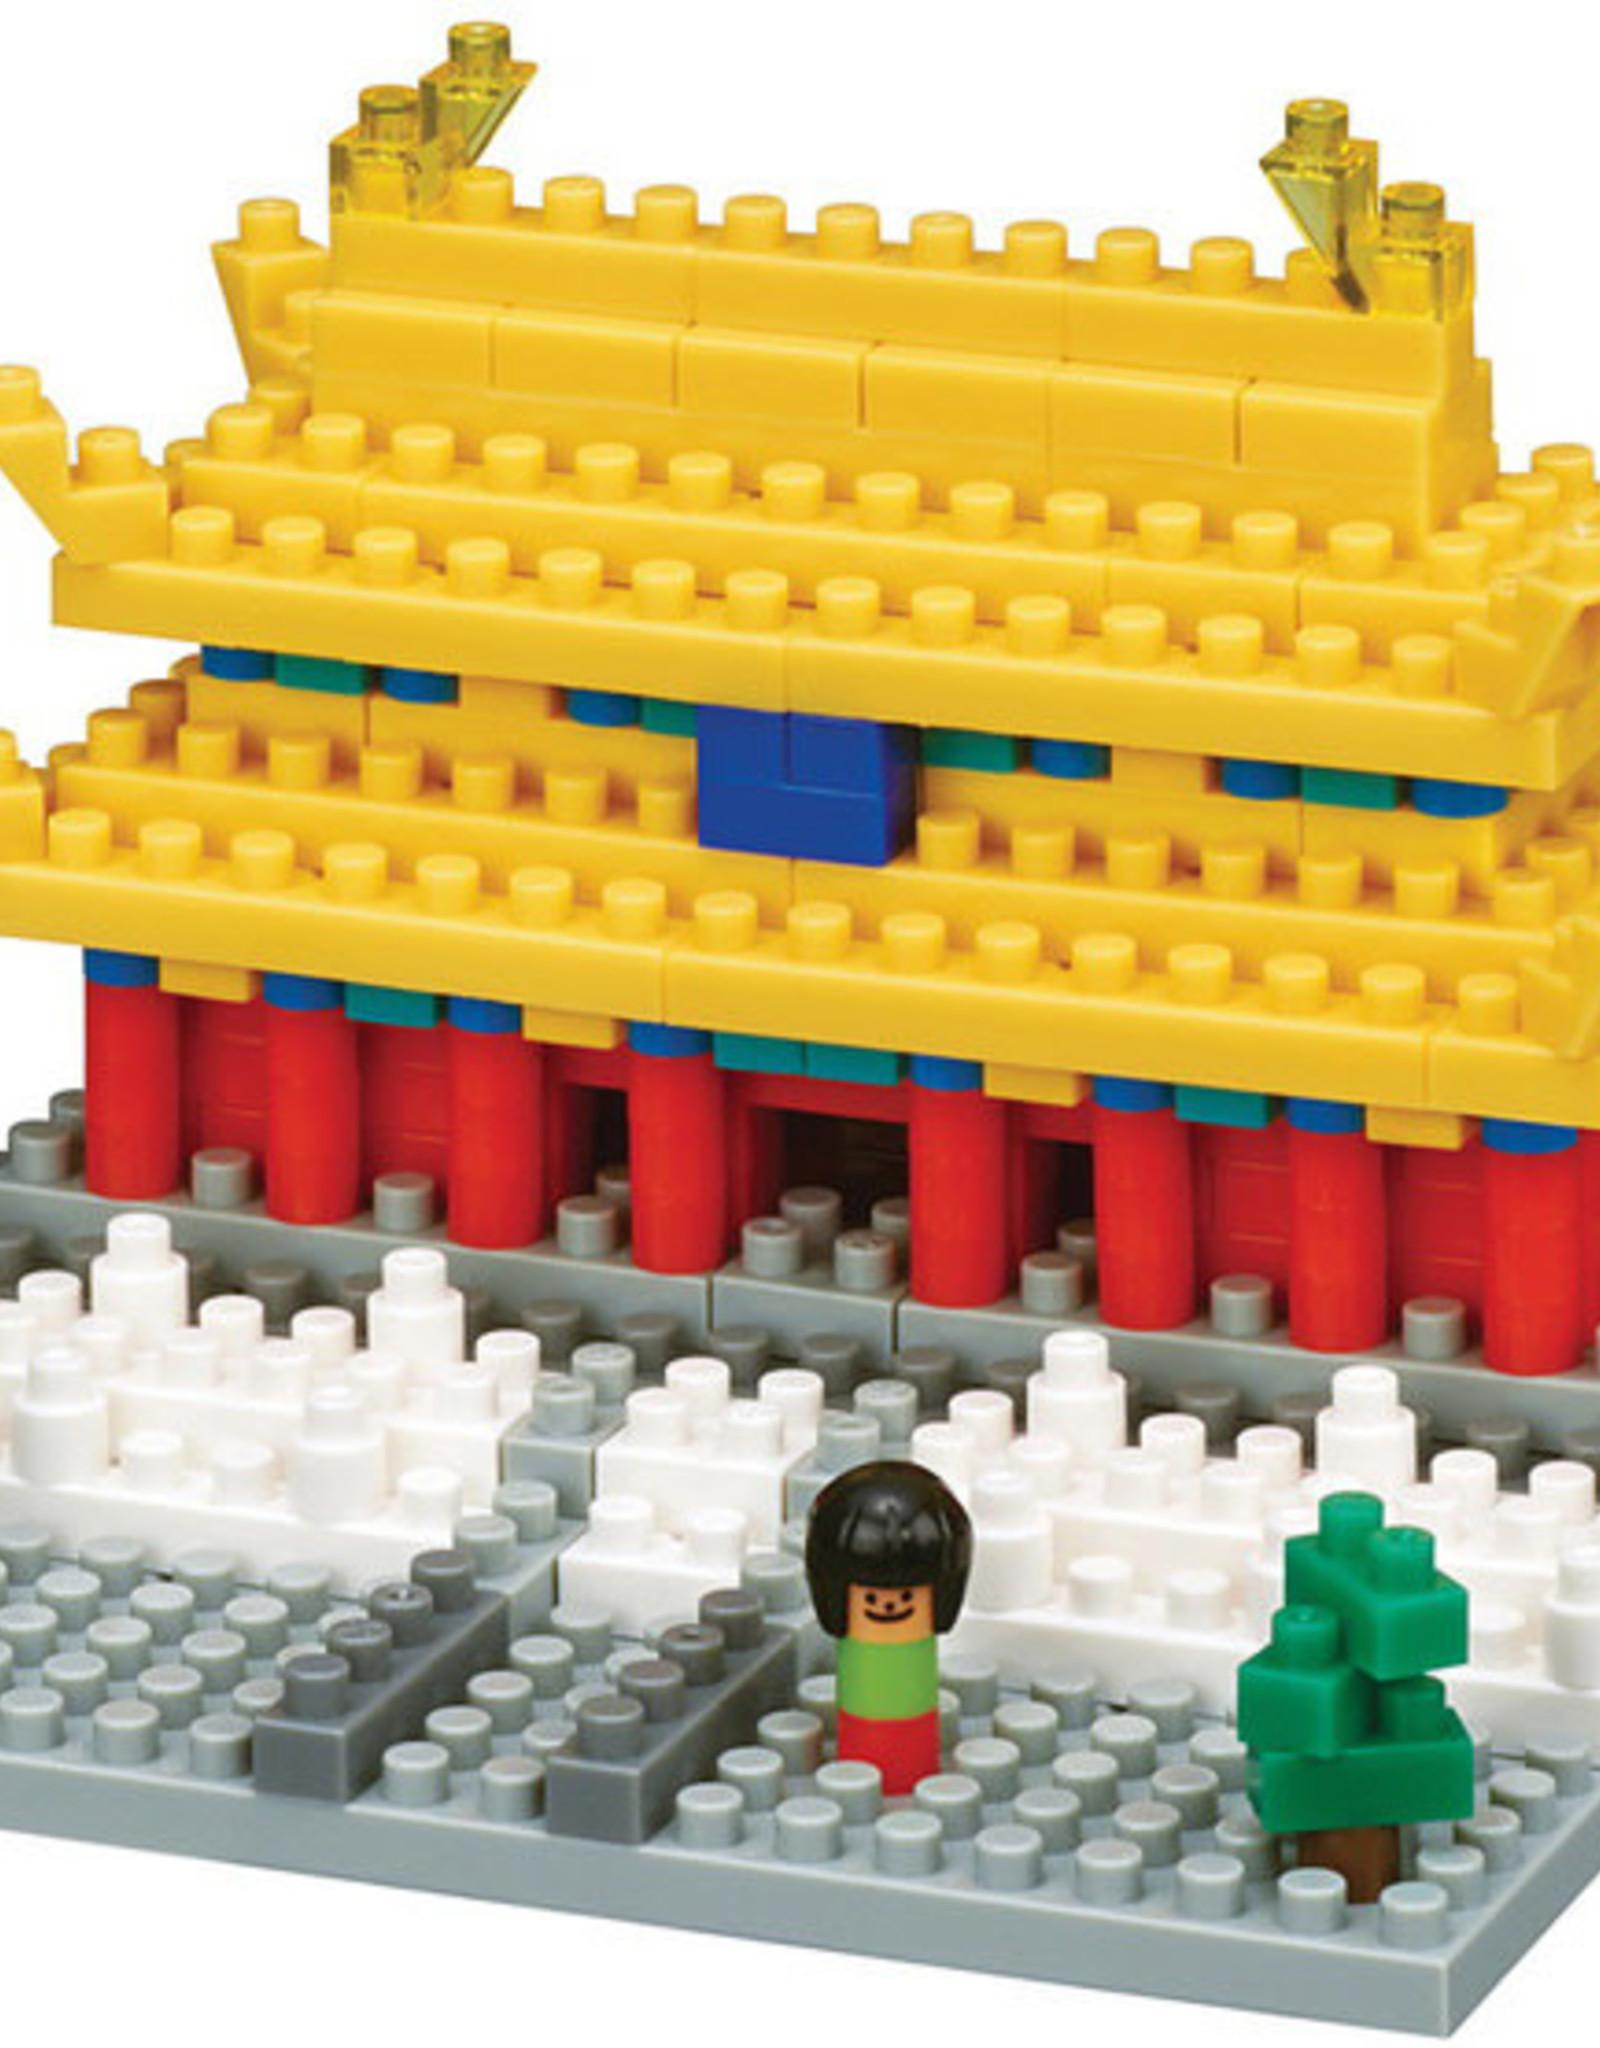 Schylling Schylling Nanoblock-The Forbidden City Blocks